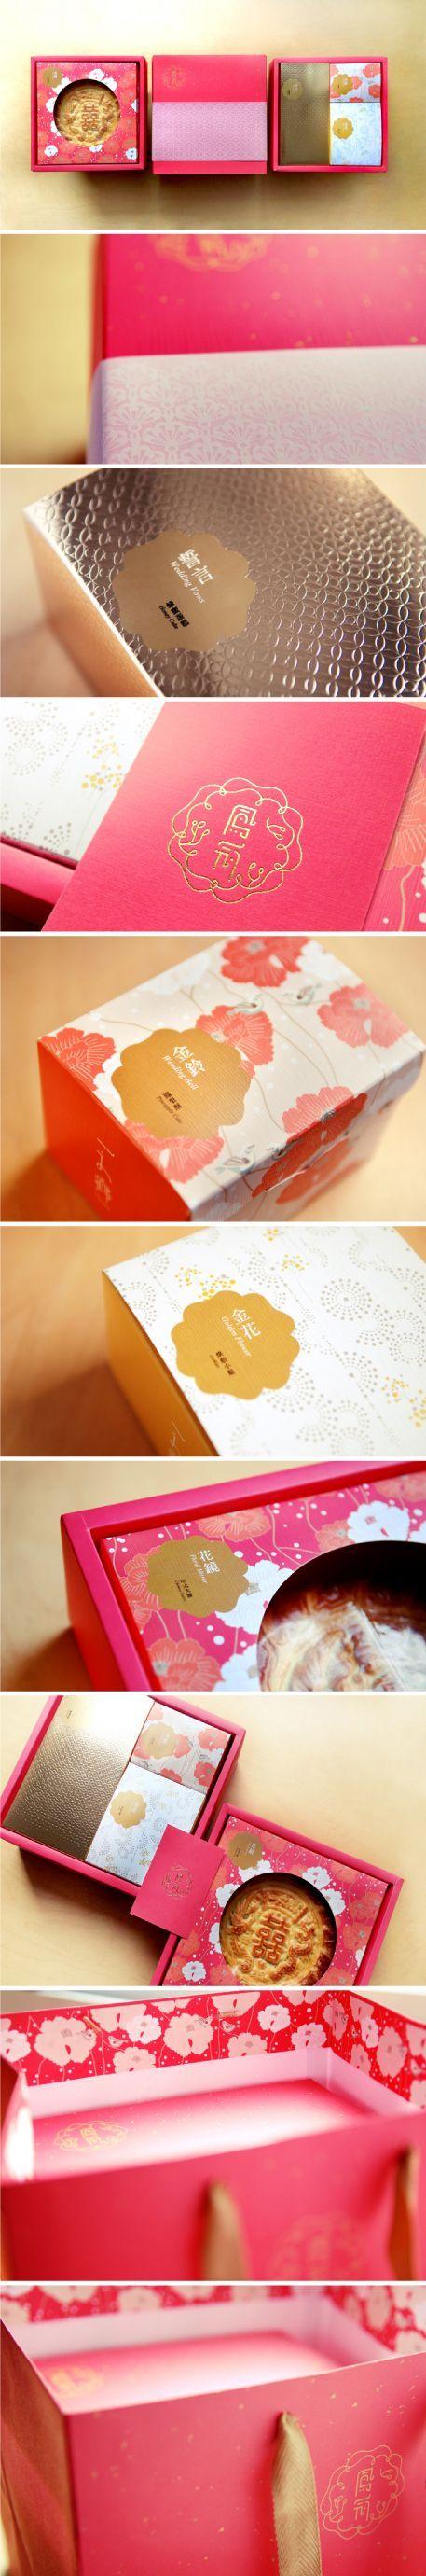 MURA DESIGN cakes #packaging